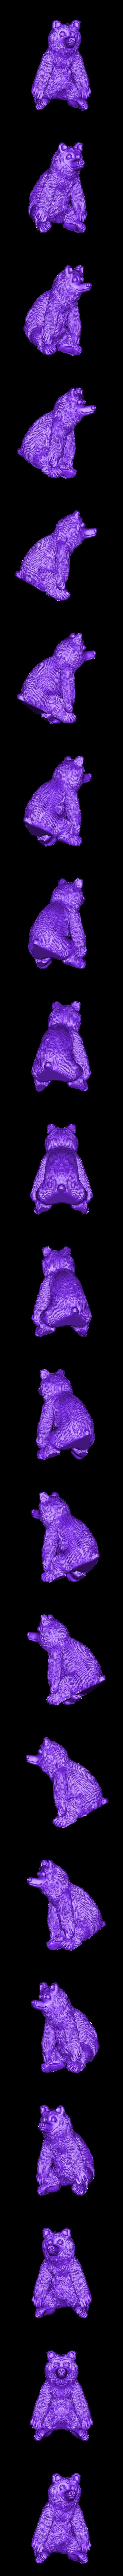 Bear.stl Download free STL file Black Bear • 3D printing design, yourwildworld